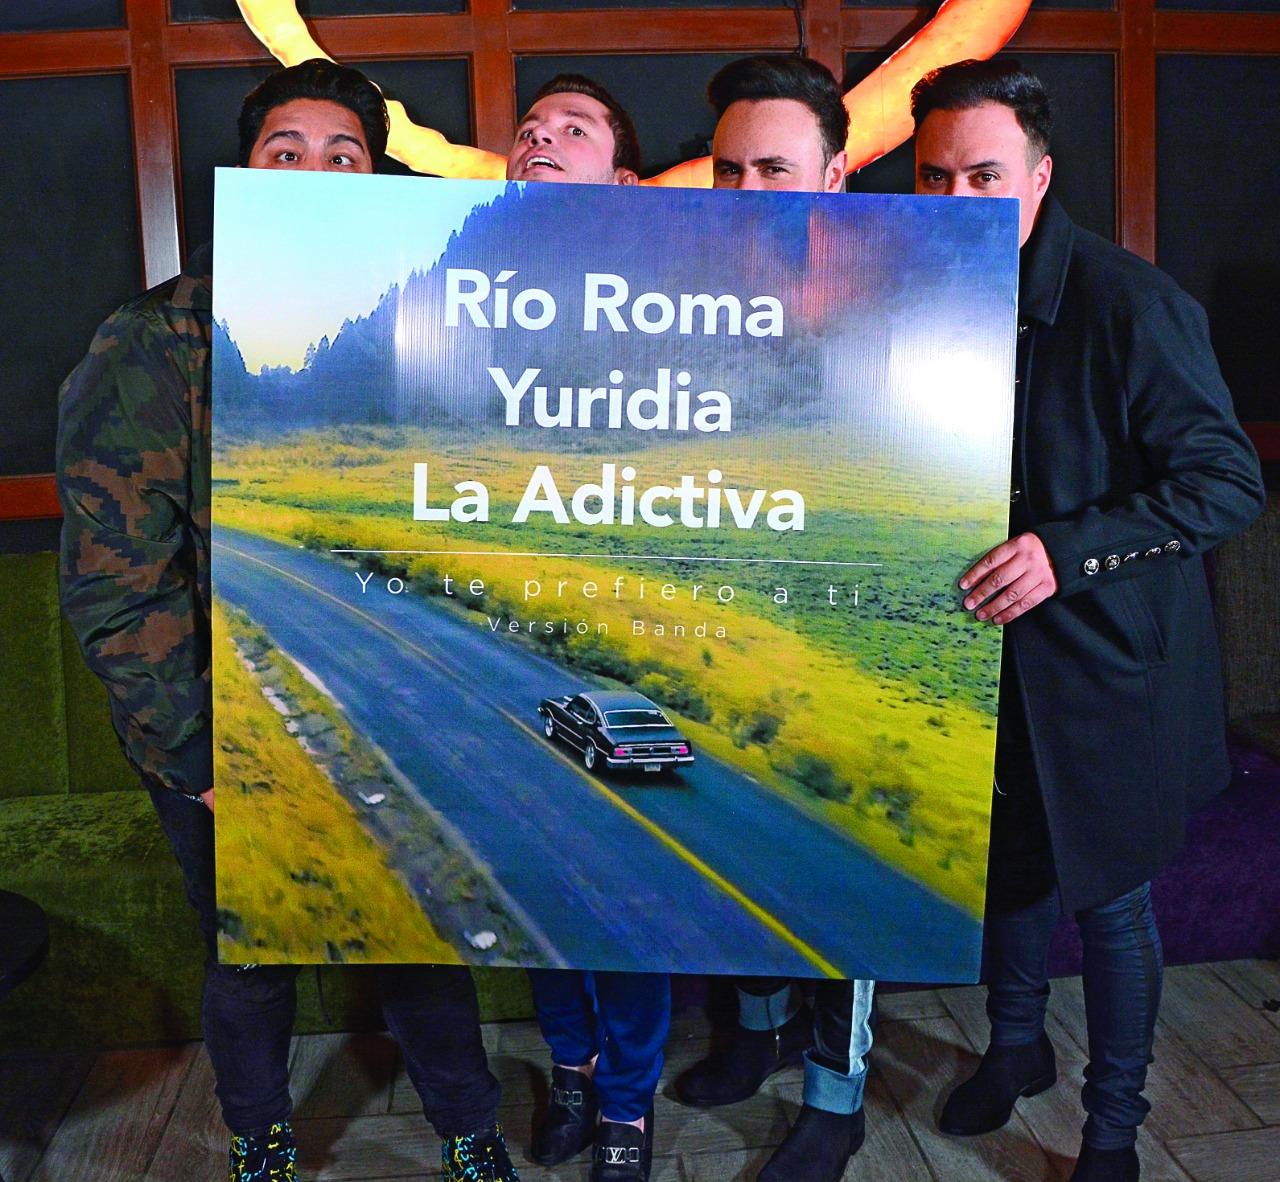 Río Roma y La Adictiva. Foto: Ricardo Cristino